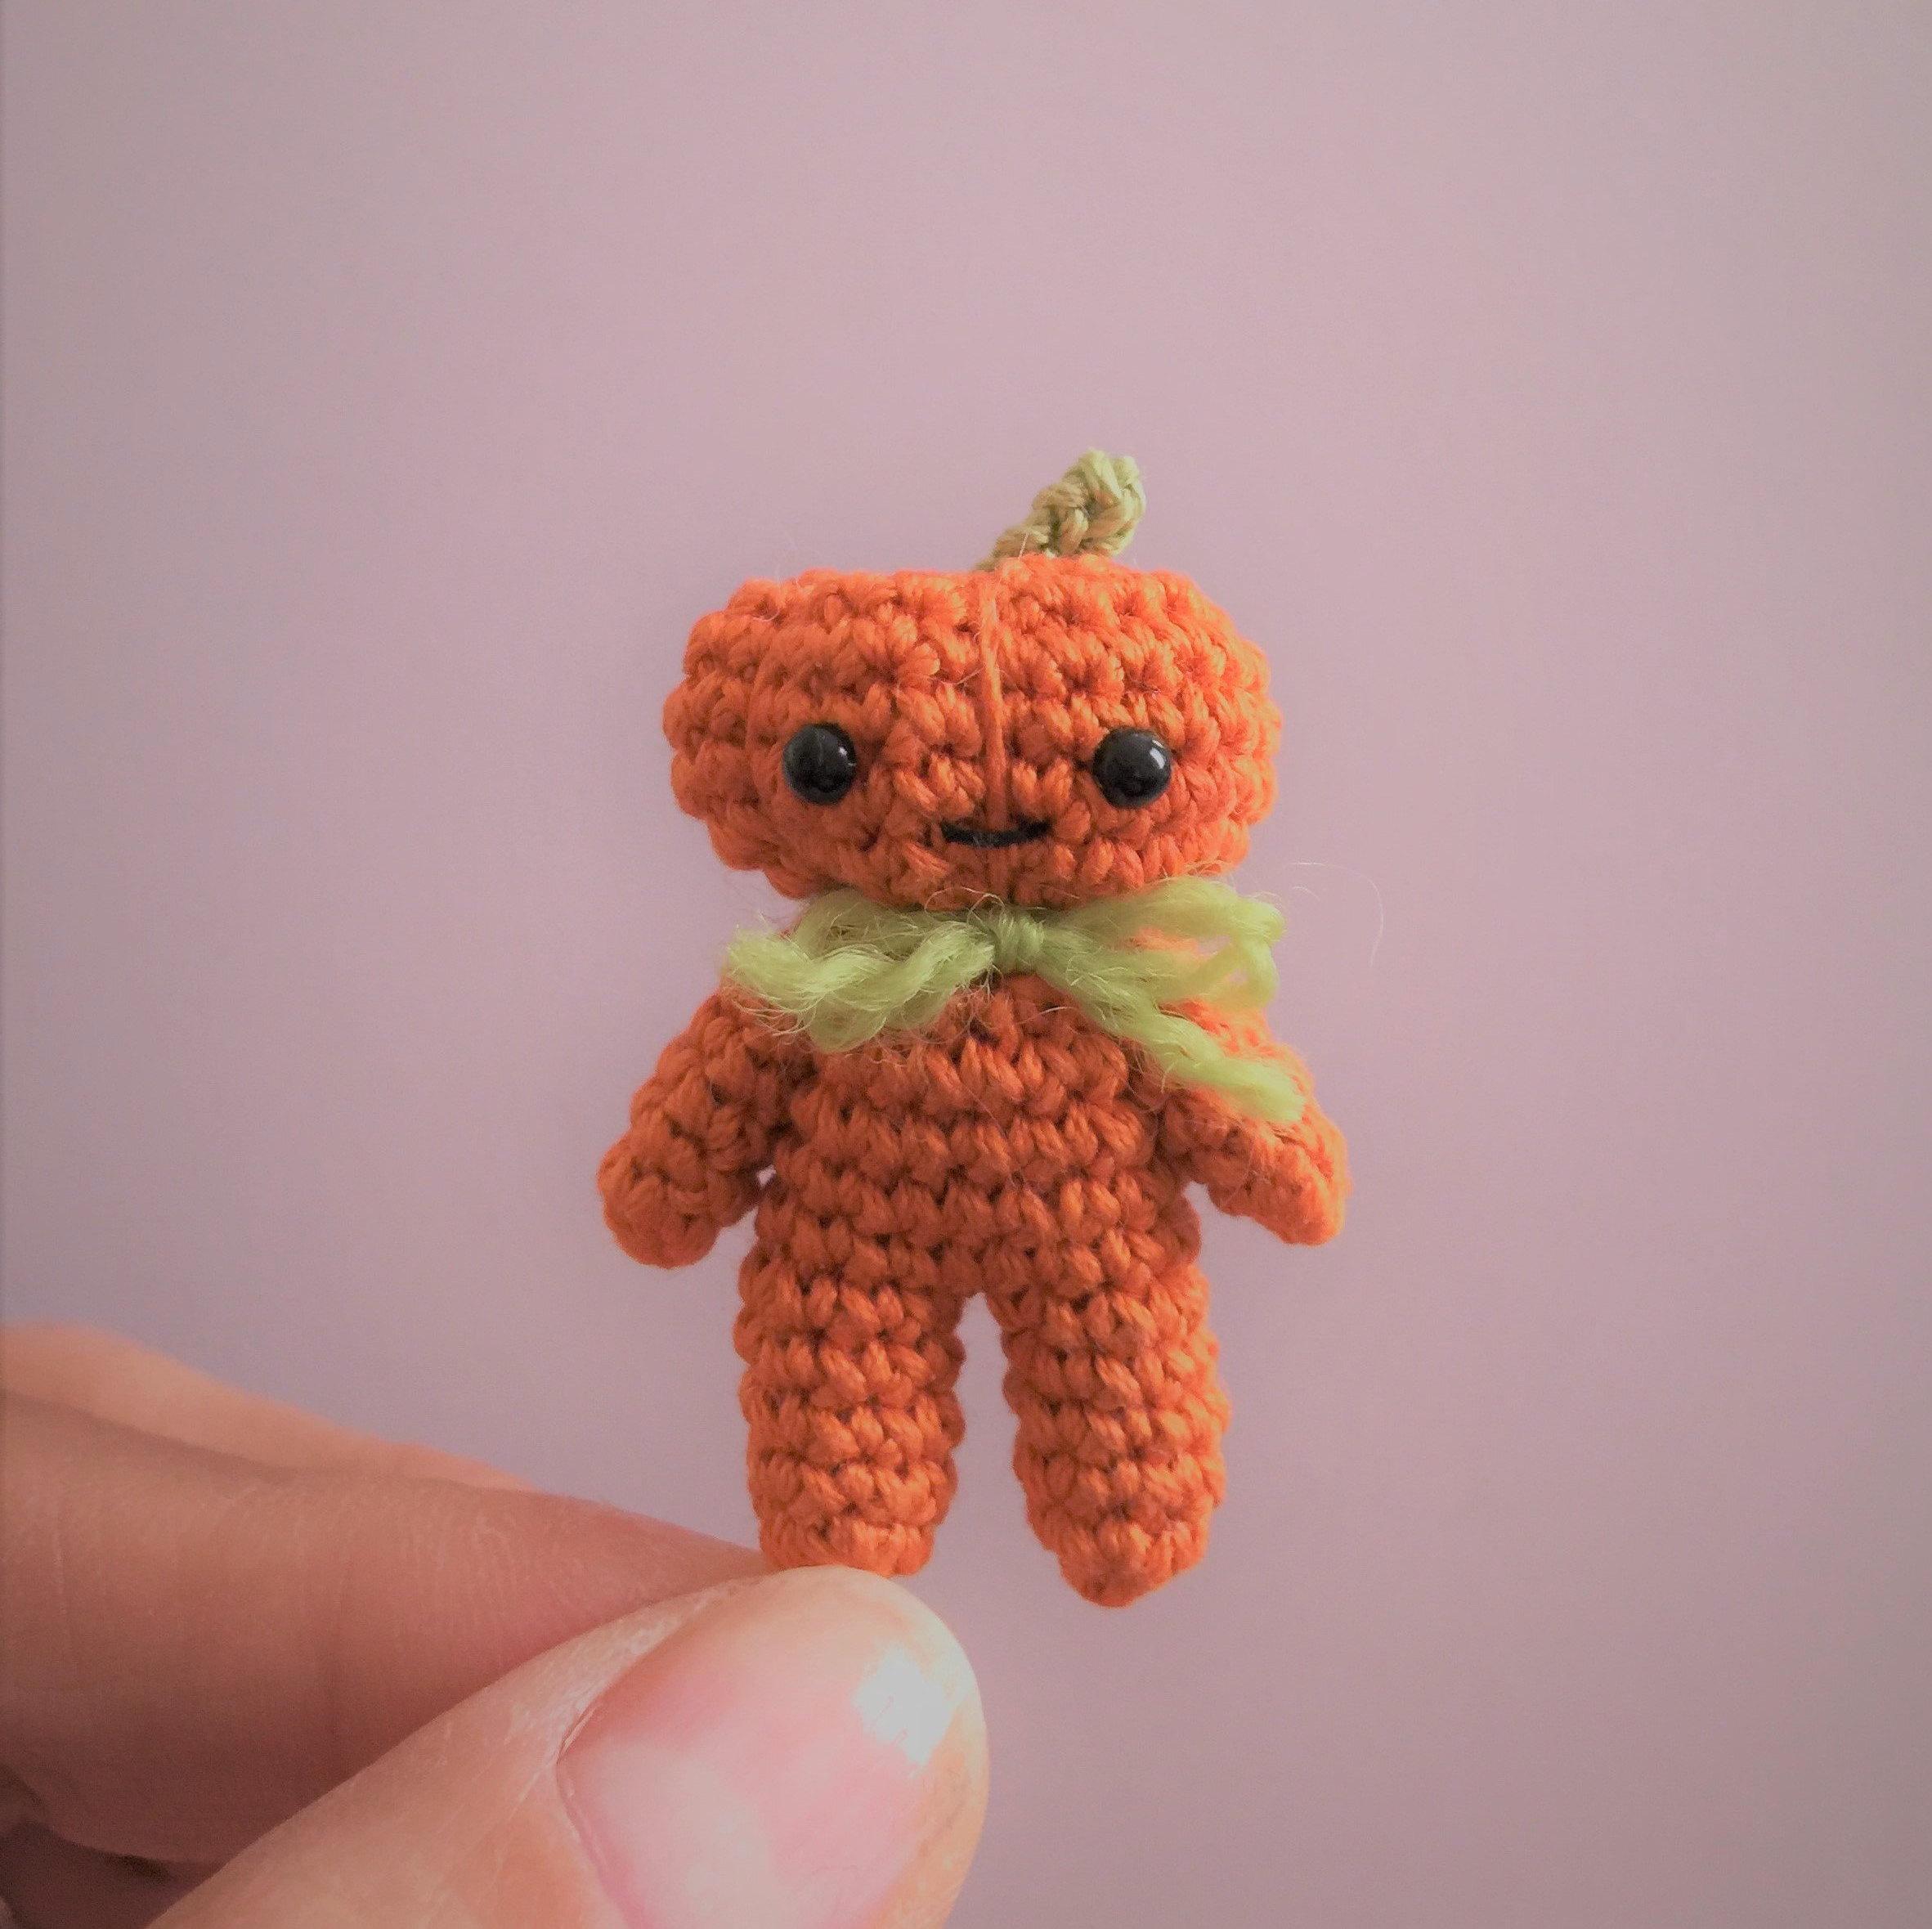 Pumpkin,Man,-,Amigurumi,Crochet,PDF,Pattern,amigurumi_pumpkin,chibi_pumpkin,crochet_pumpkin,crochet_halloween,pumpkin_man,Kawaii_crochet_pumpkin,mariella_vitale,PDF_Pattern,Crochet_Tutorial,crochet_pattern,miniature_amigurumi,miniature_crochet,amigurumi,micro_crochet